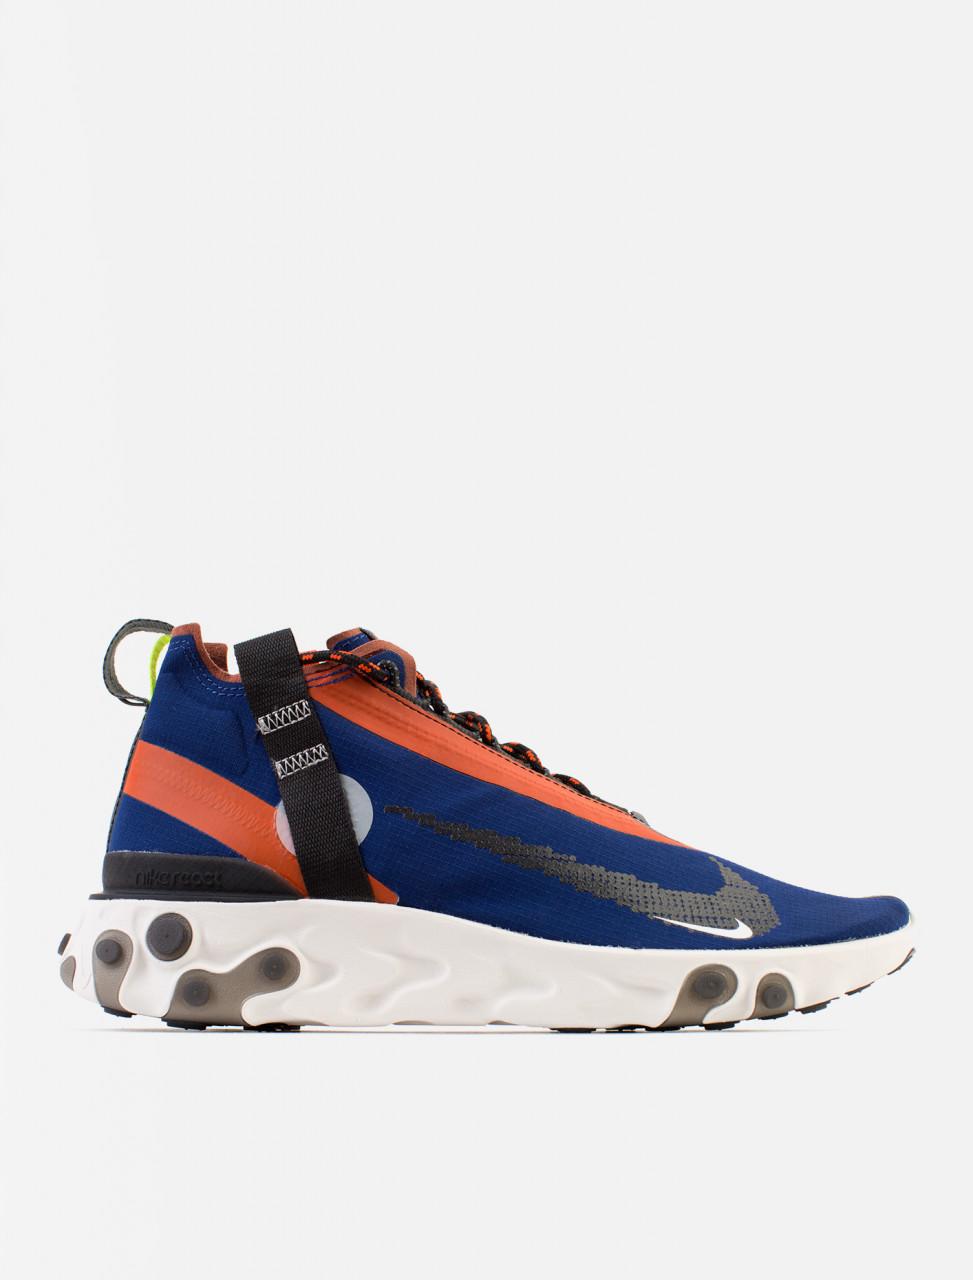 React Mid WR ISPA Sneaker